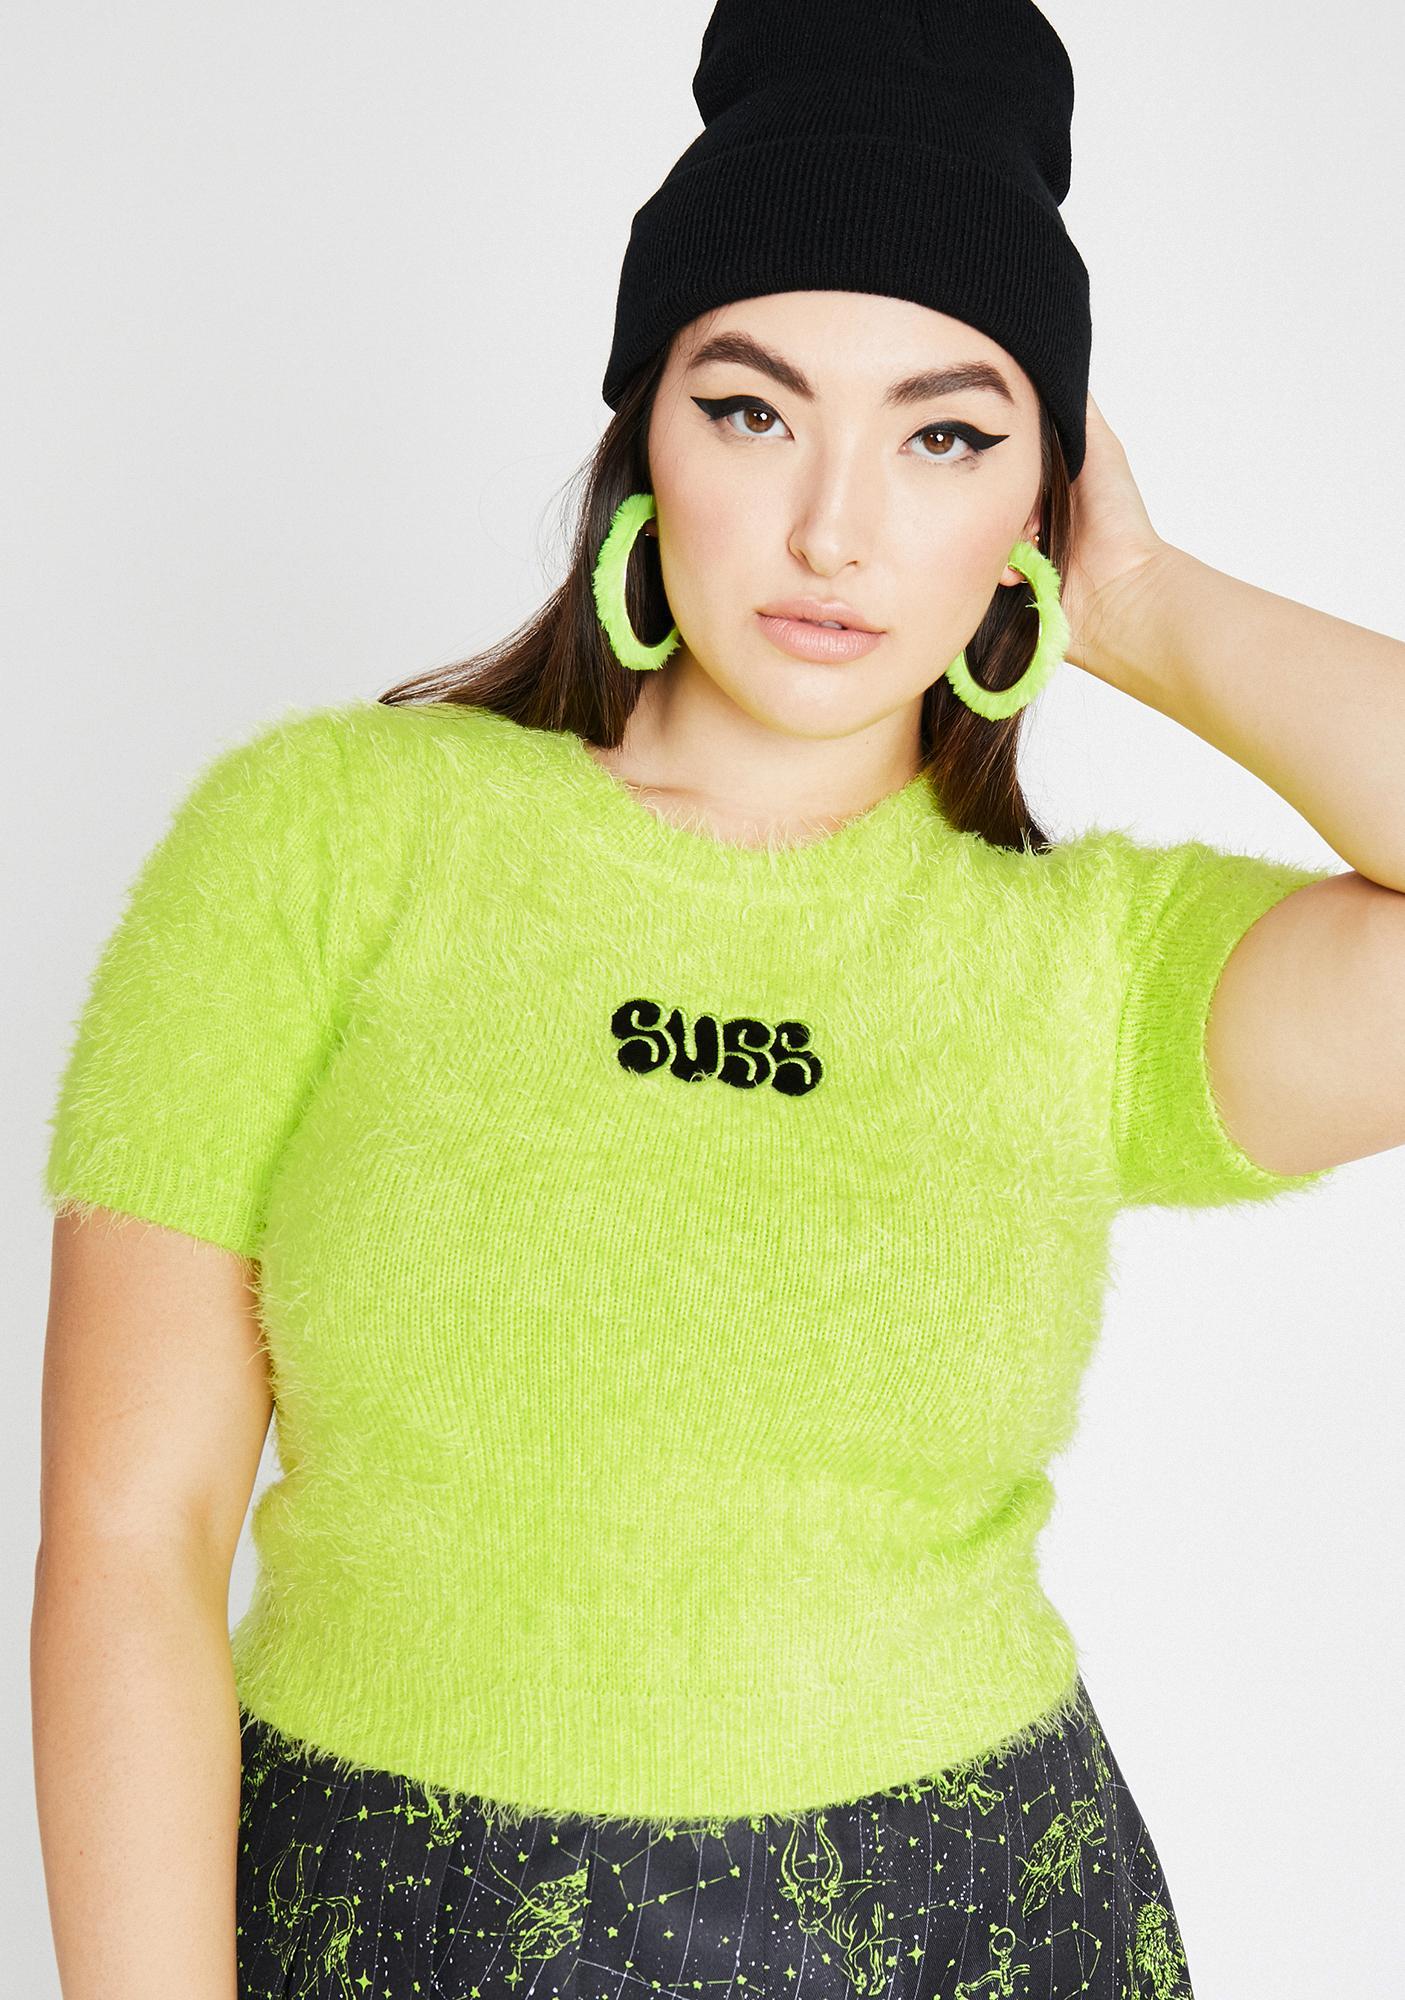 HOROSCOPEZ Sis Don't Be SUSS Fuzzy Sweater